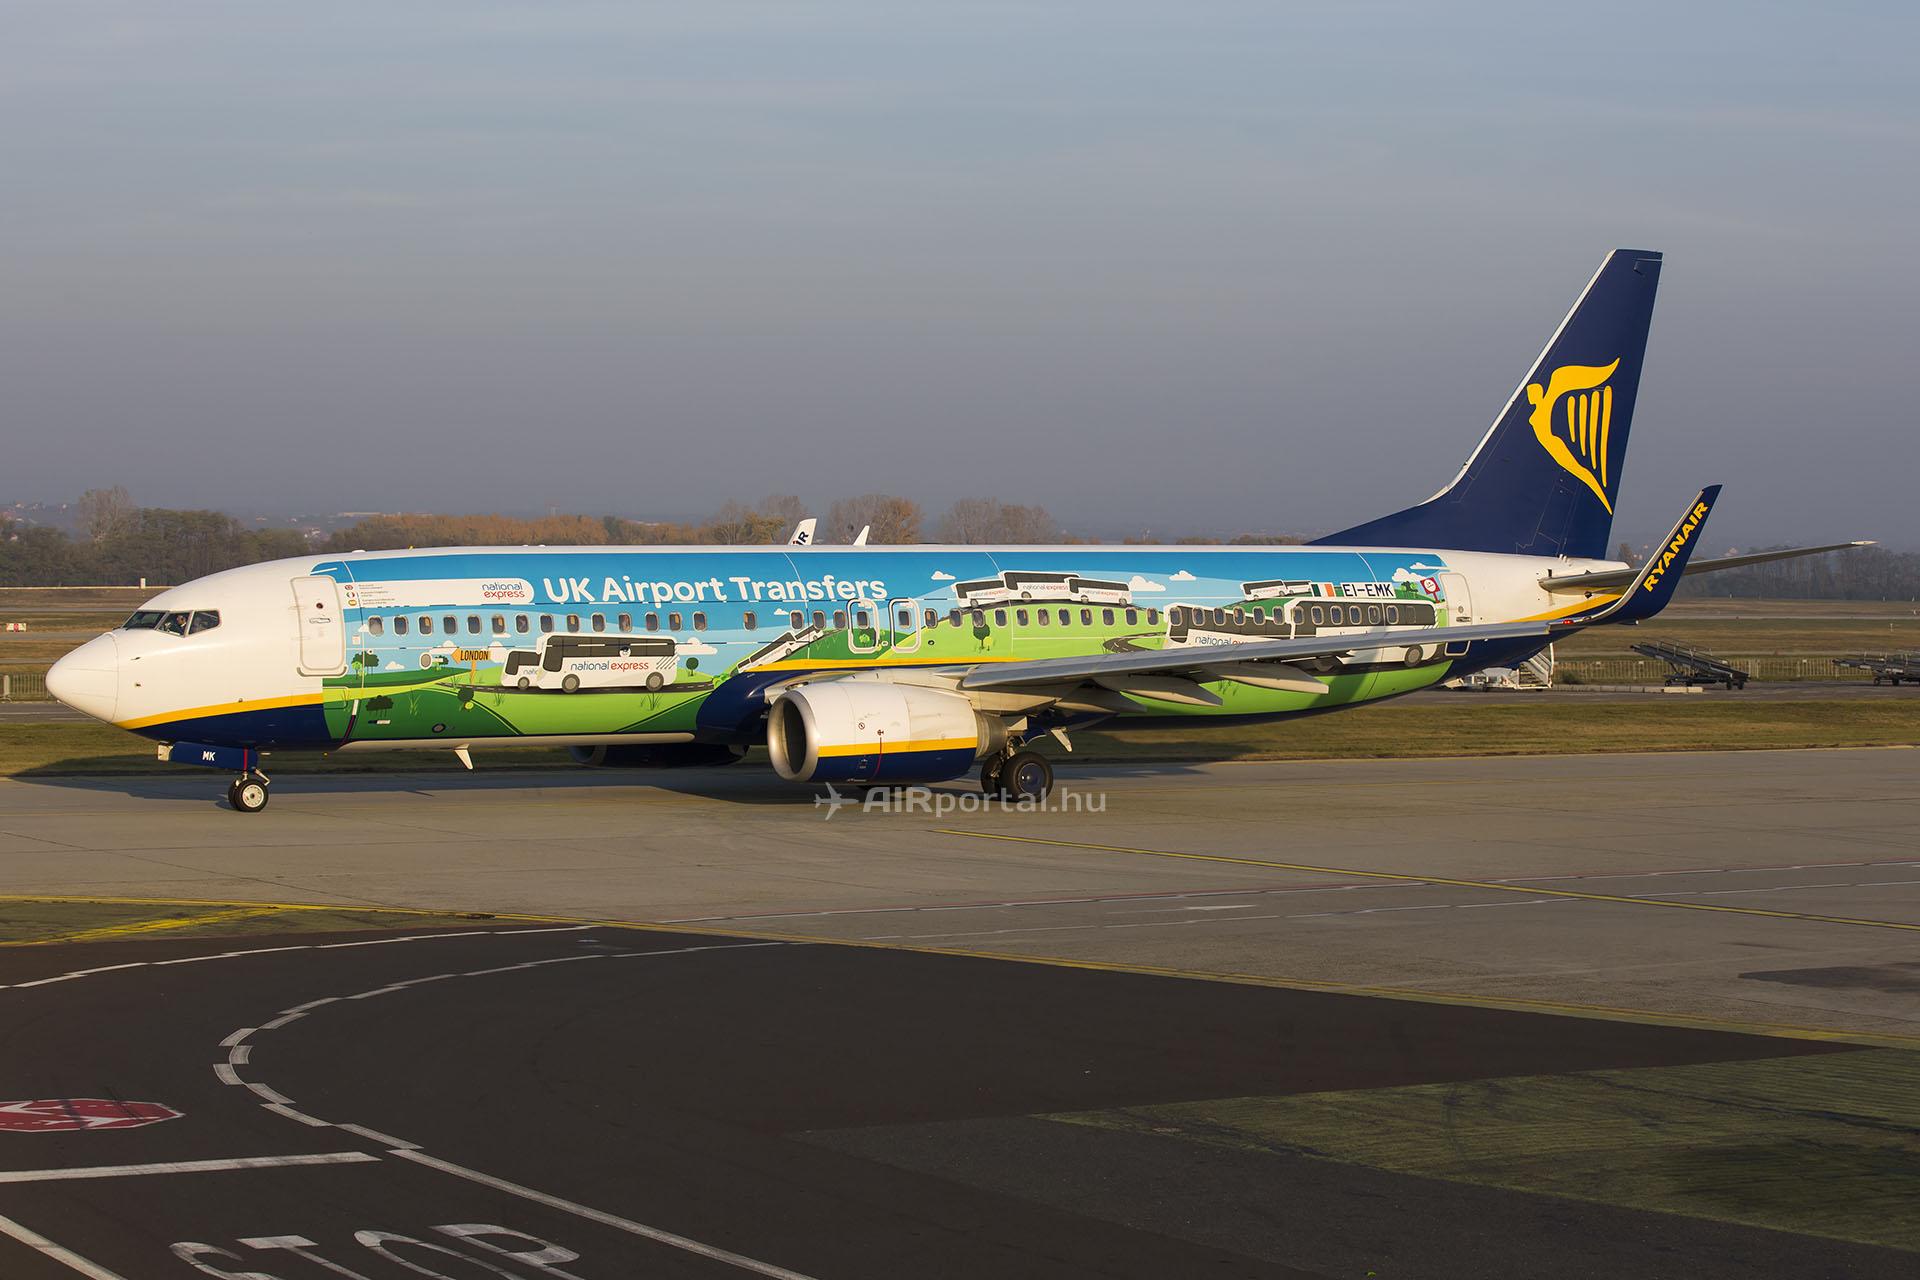 Különleges promóciós festéssel ellátott Ryanair Boeing 737-800 indulóban Budapestről. (Fotó: AIRportal.hu) | © AIRportal.hu